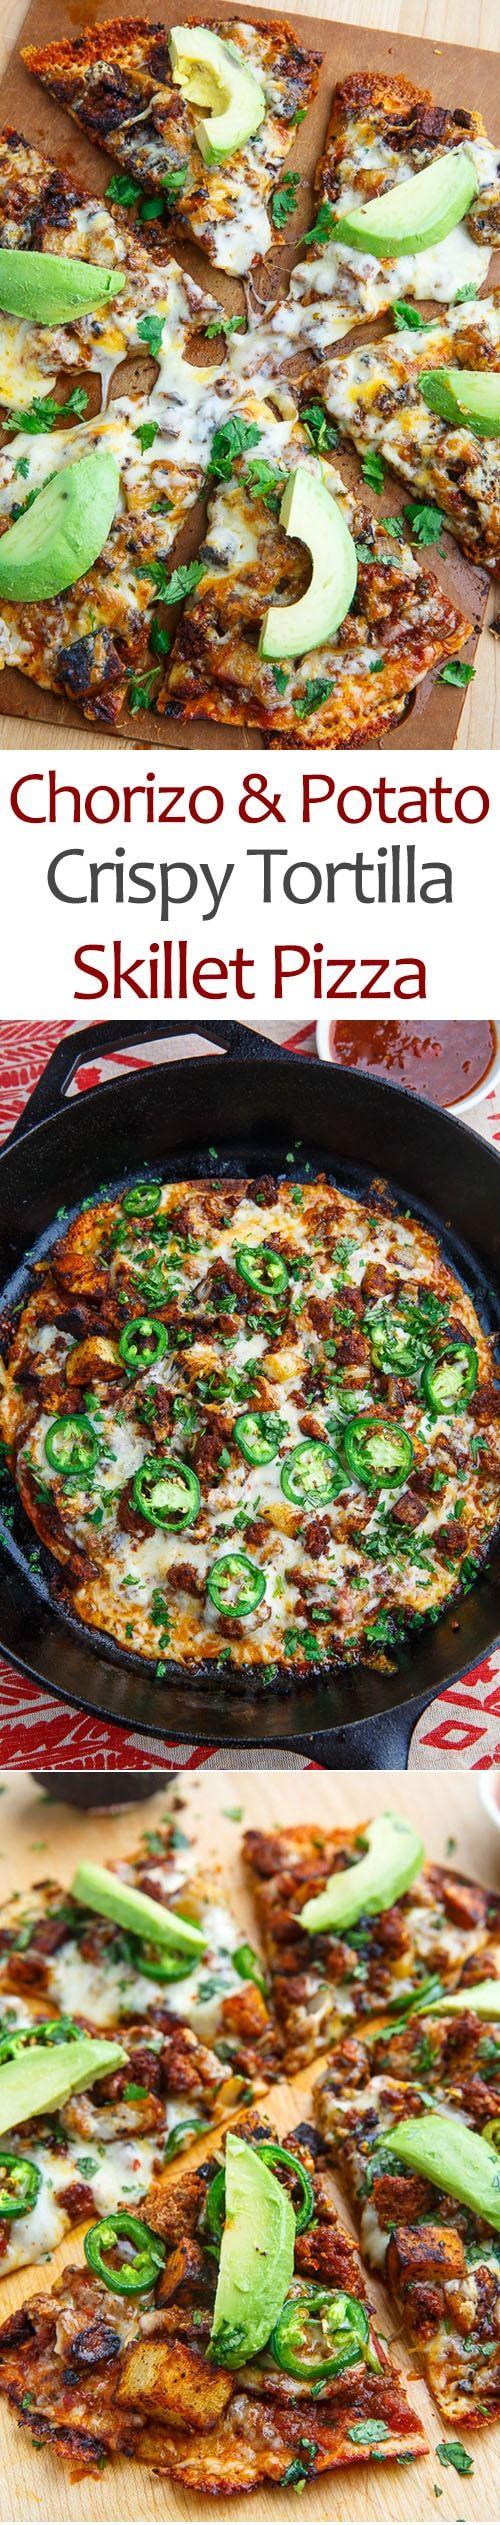 Crispy Chorizo and Potato Tortilla Skillet Pizza